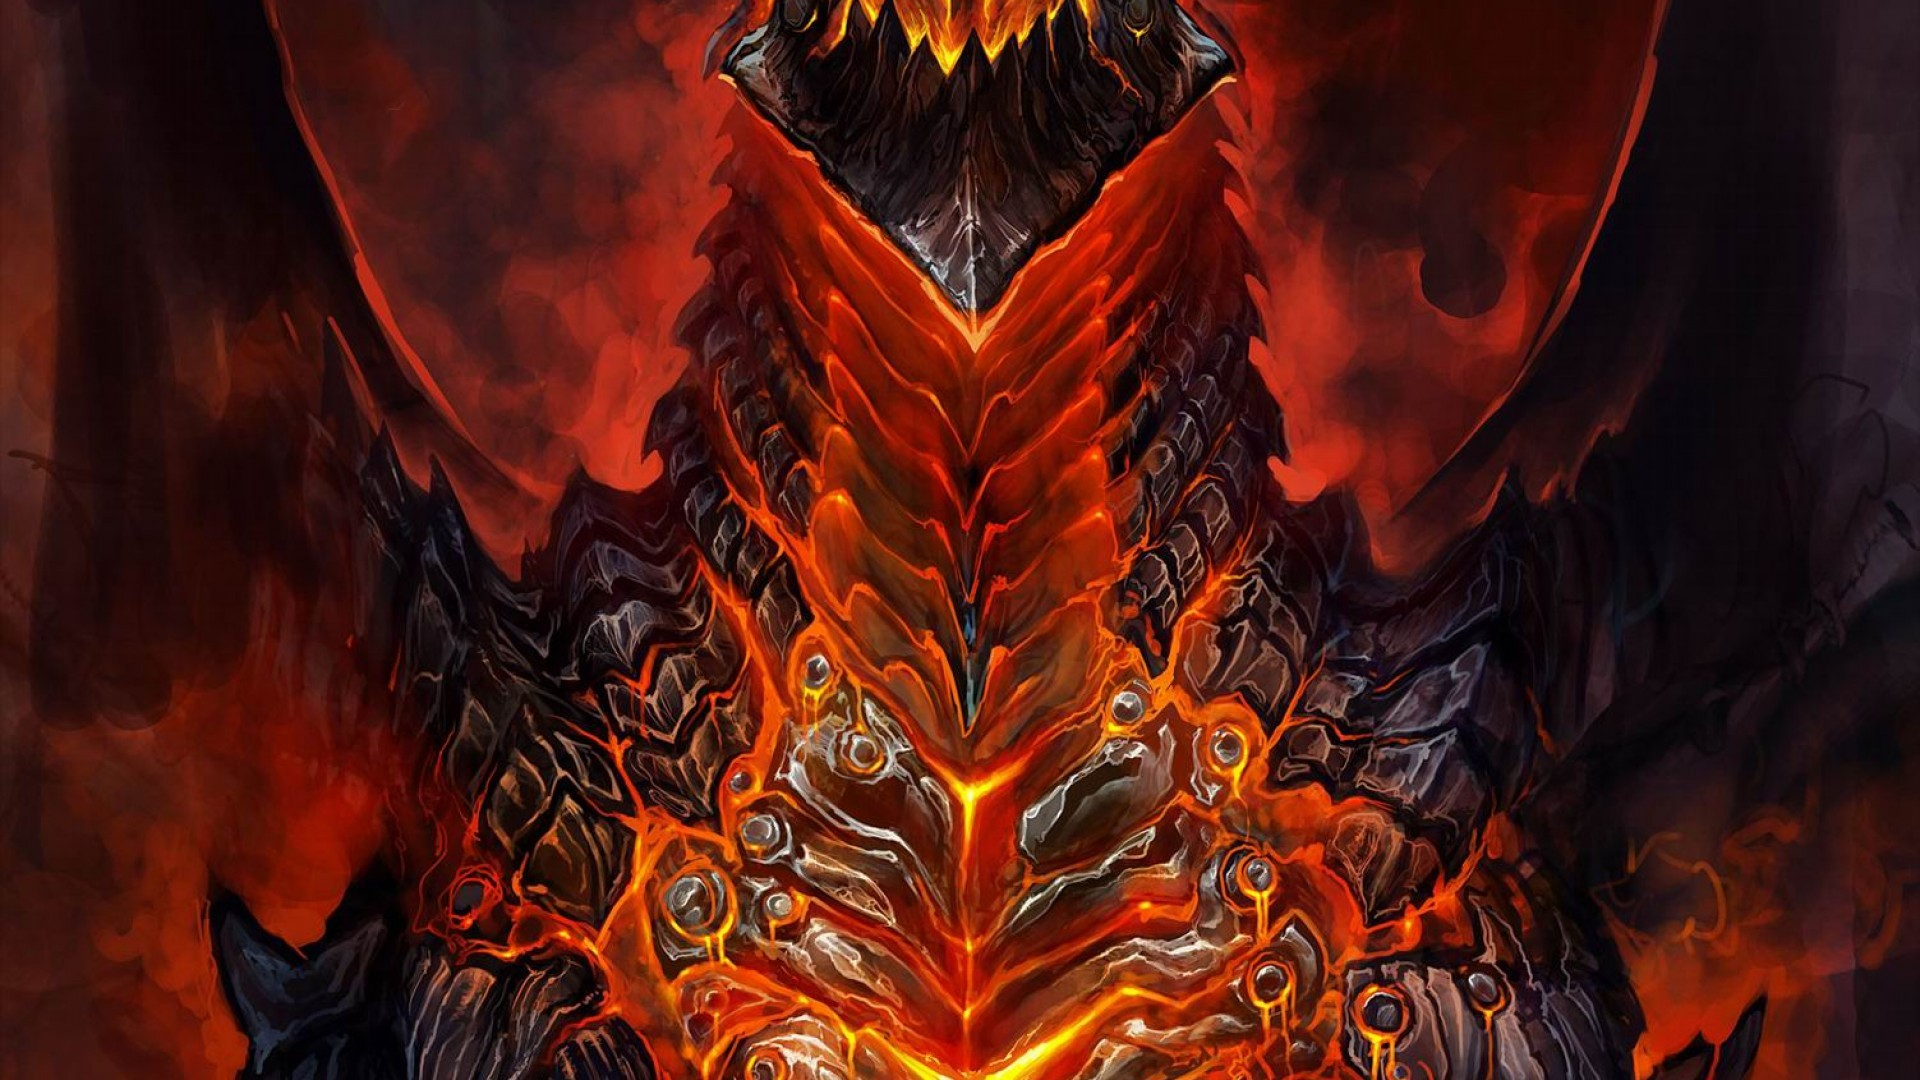 World Of Warcraft Wallpaper 1920x1080: Deathwing Wallpaper (76+ Images